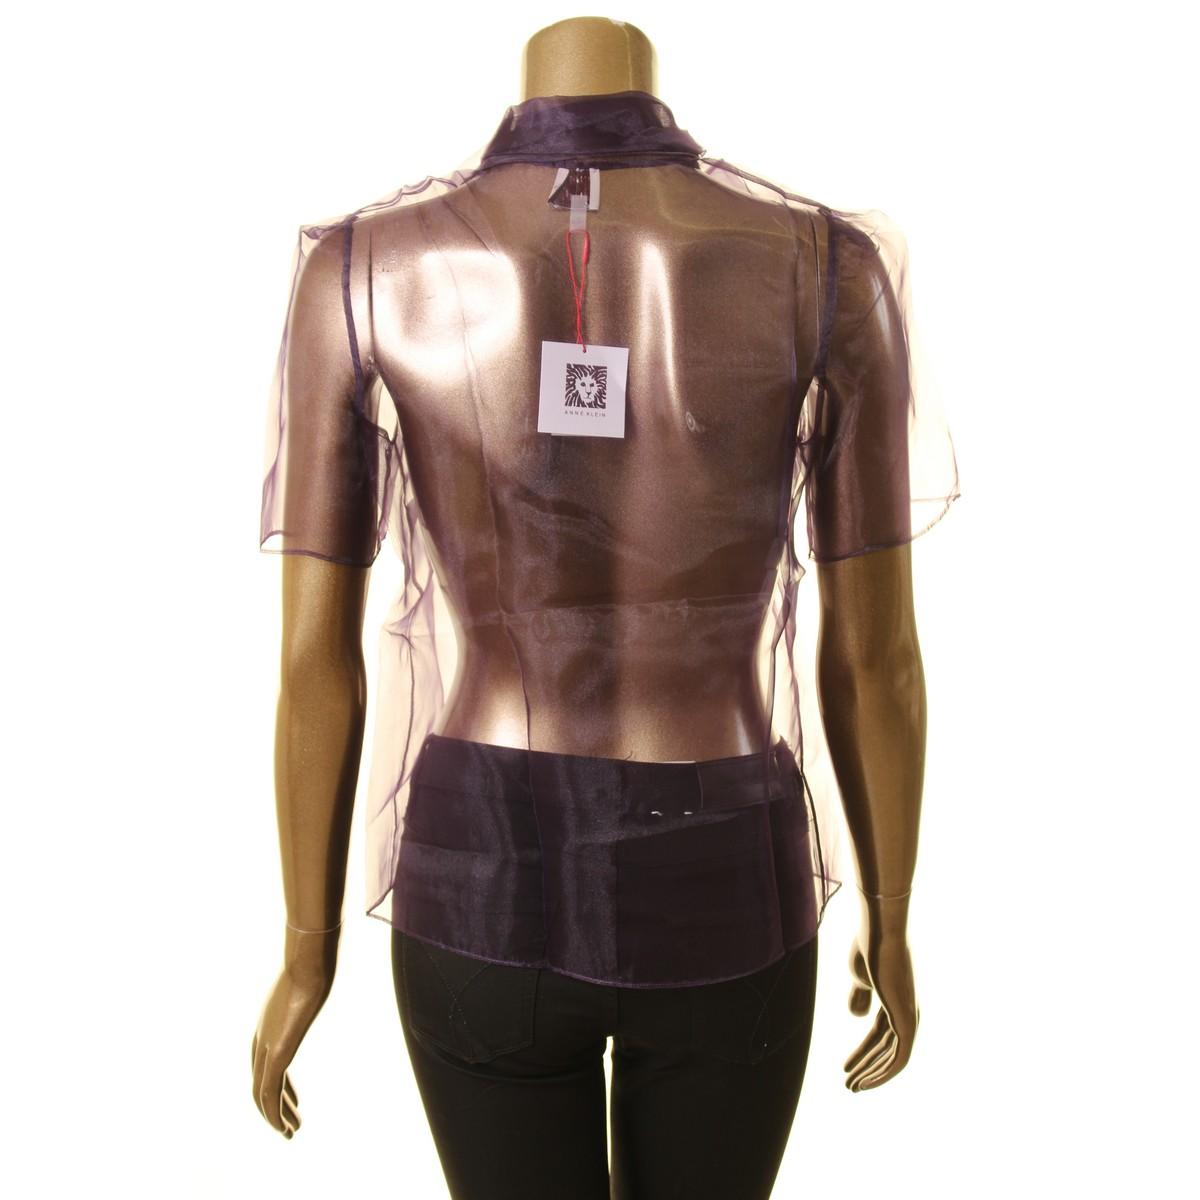 ANNE-KLEIN-NEW-Women-039-s-Short-Sleeve-Sheer-Tie-Neck-Blouse-Shirt-Top-TEDO thumbnail 6